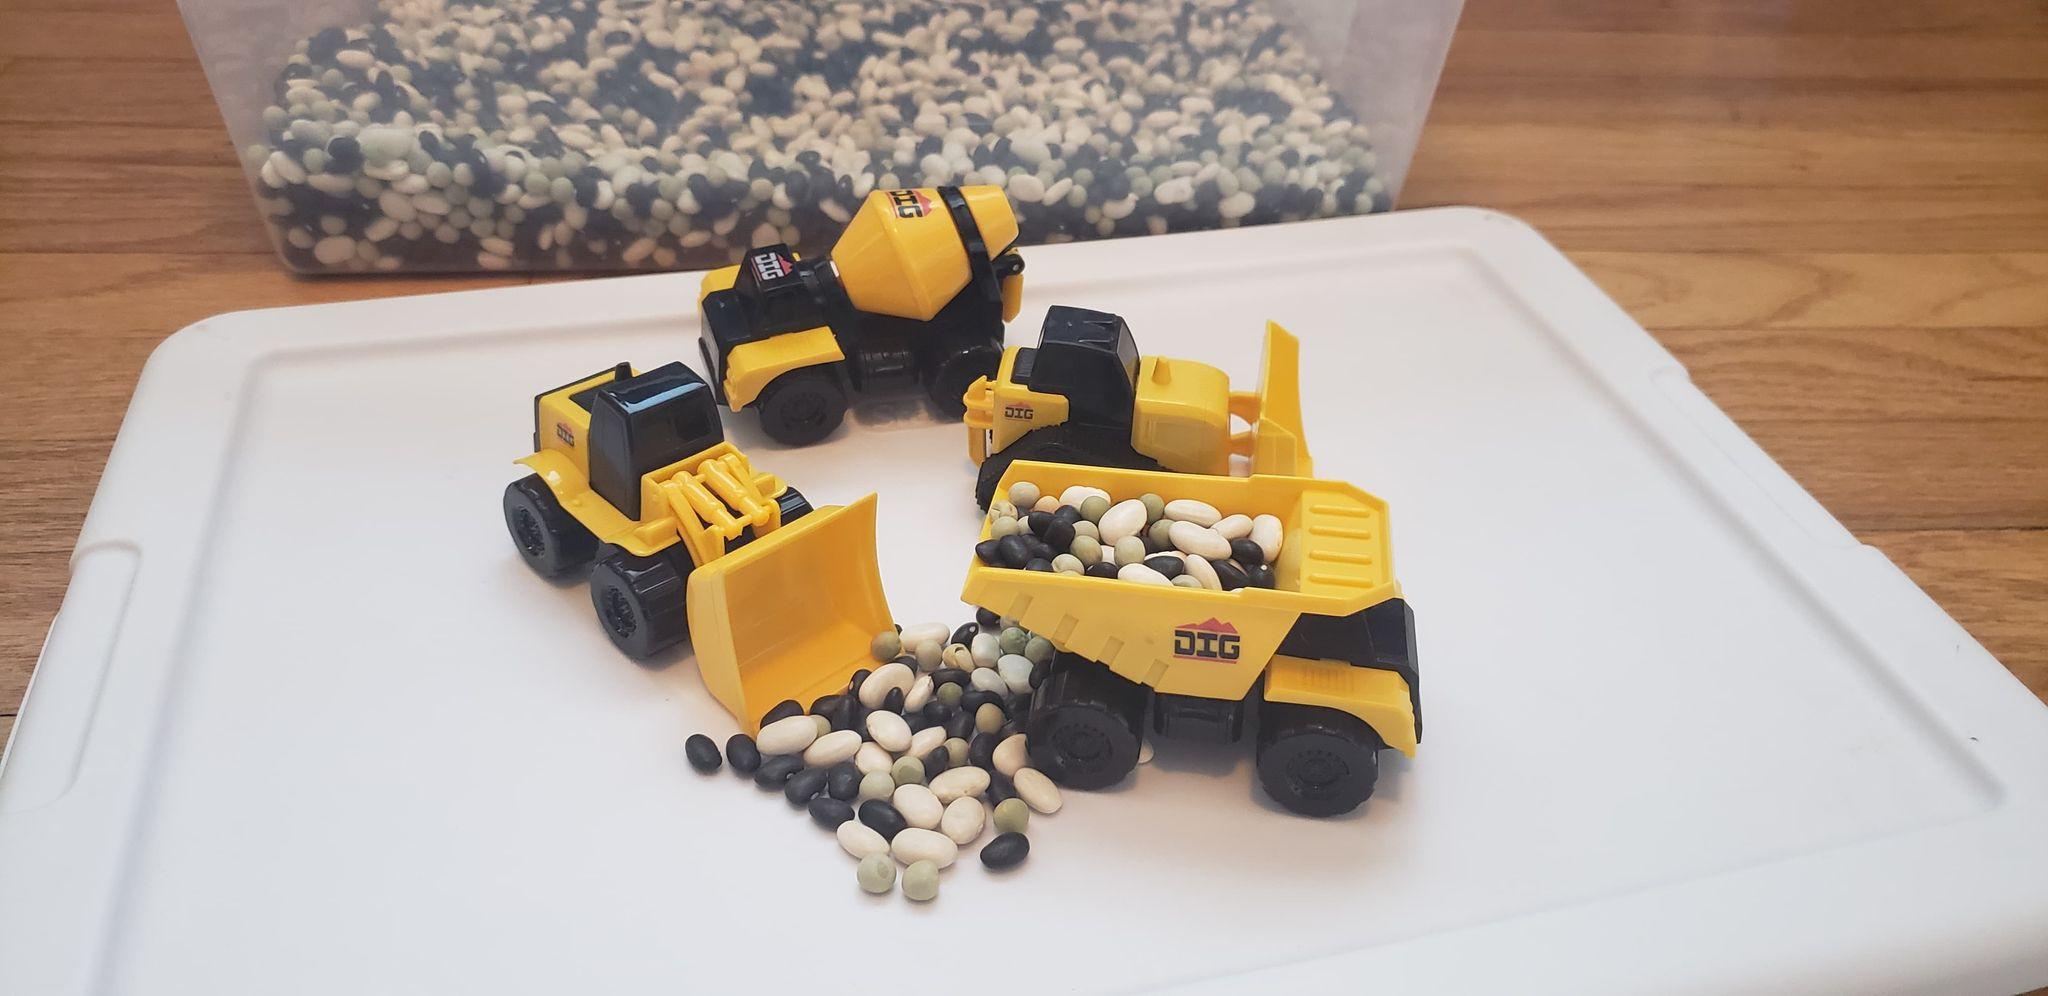 four small construction trucks